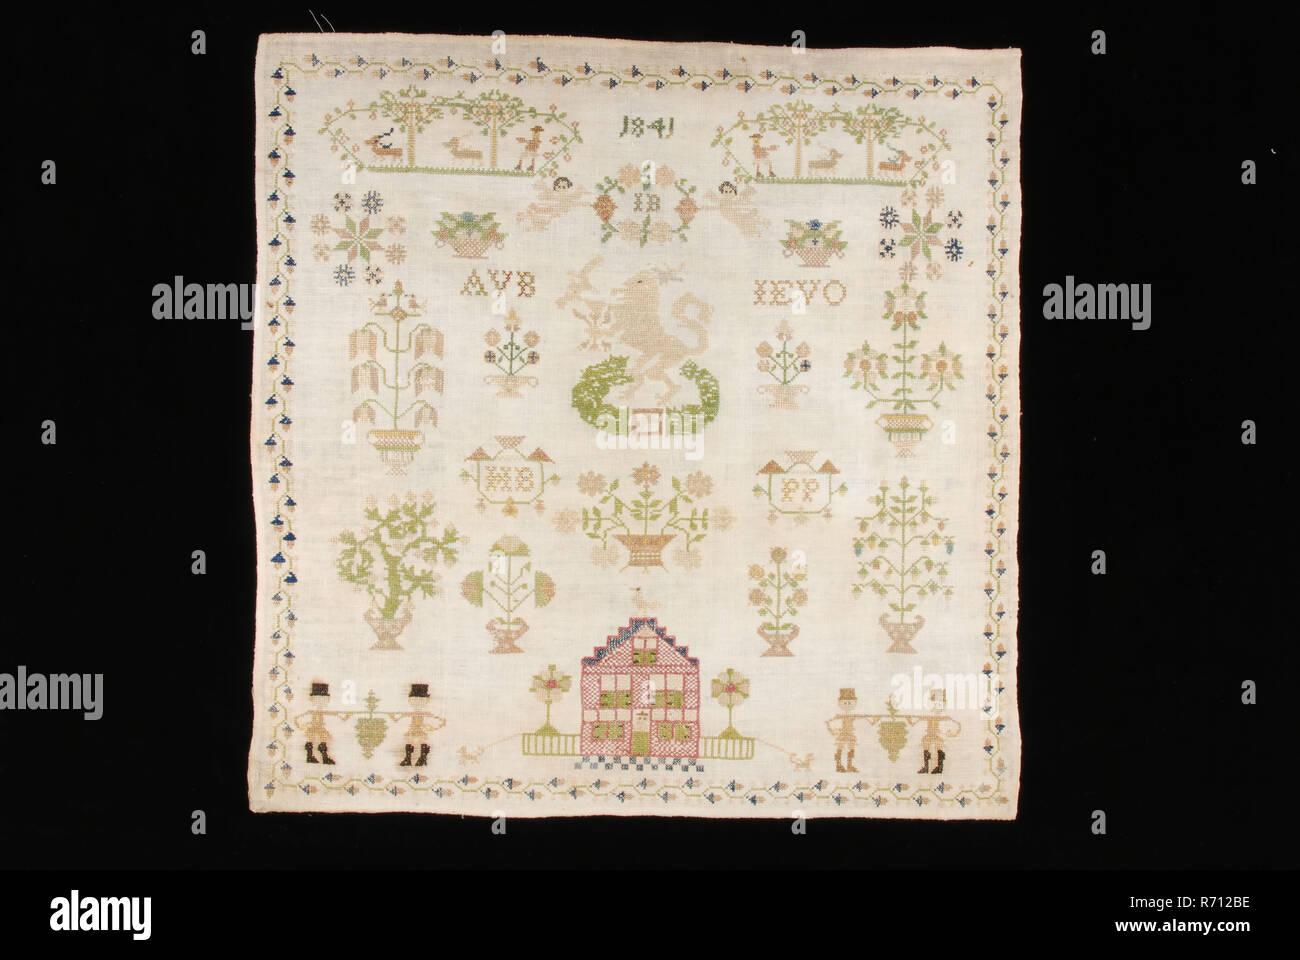 White Cotton Thread Embroidered Imágenes De Stock & White Cotton ...